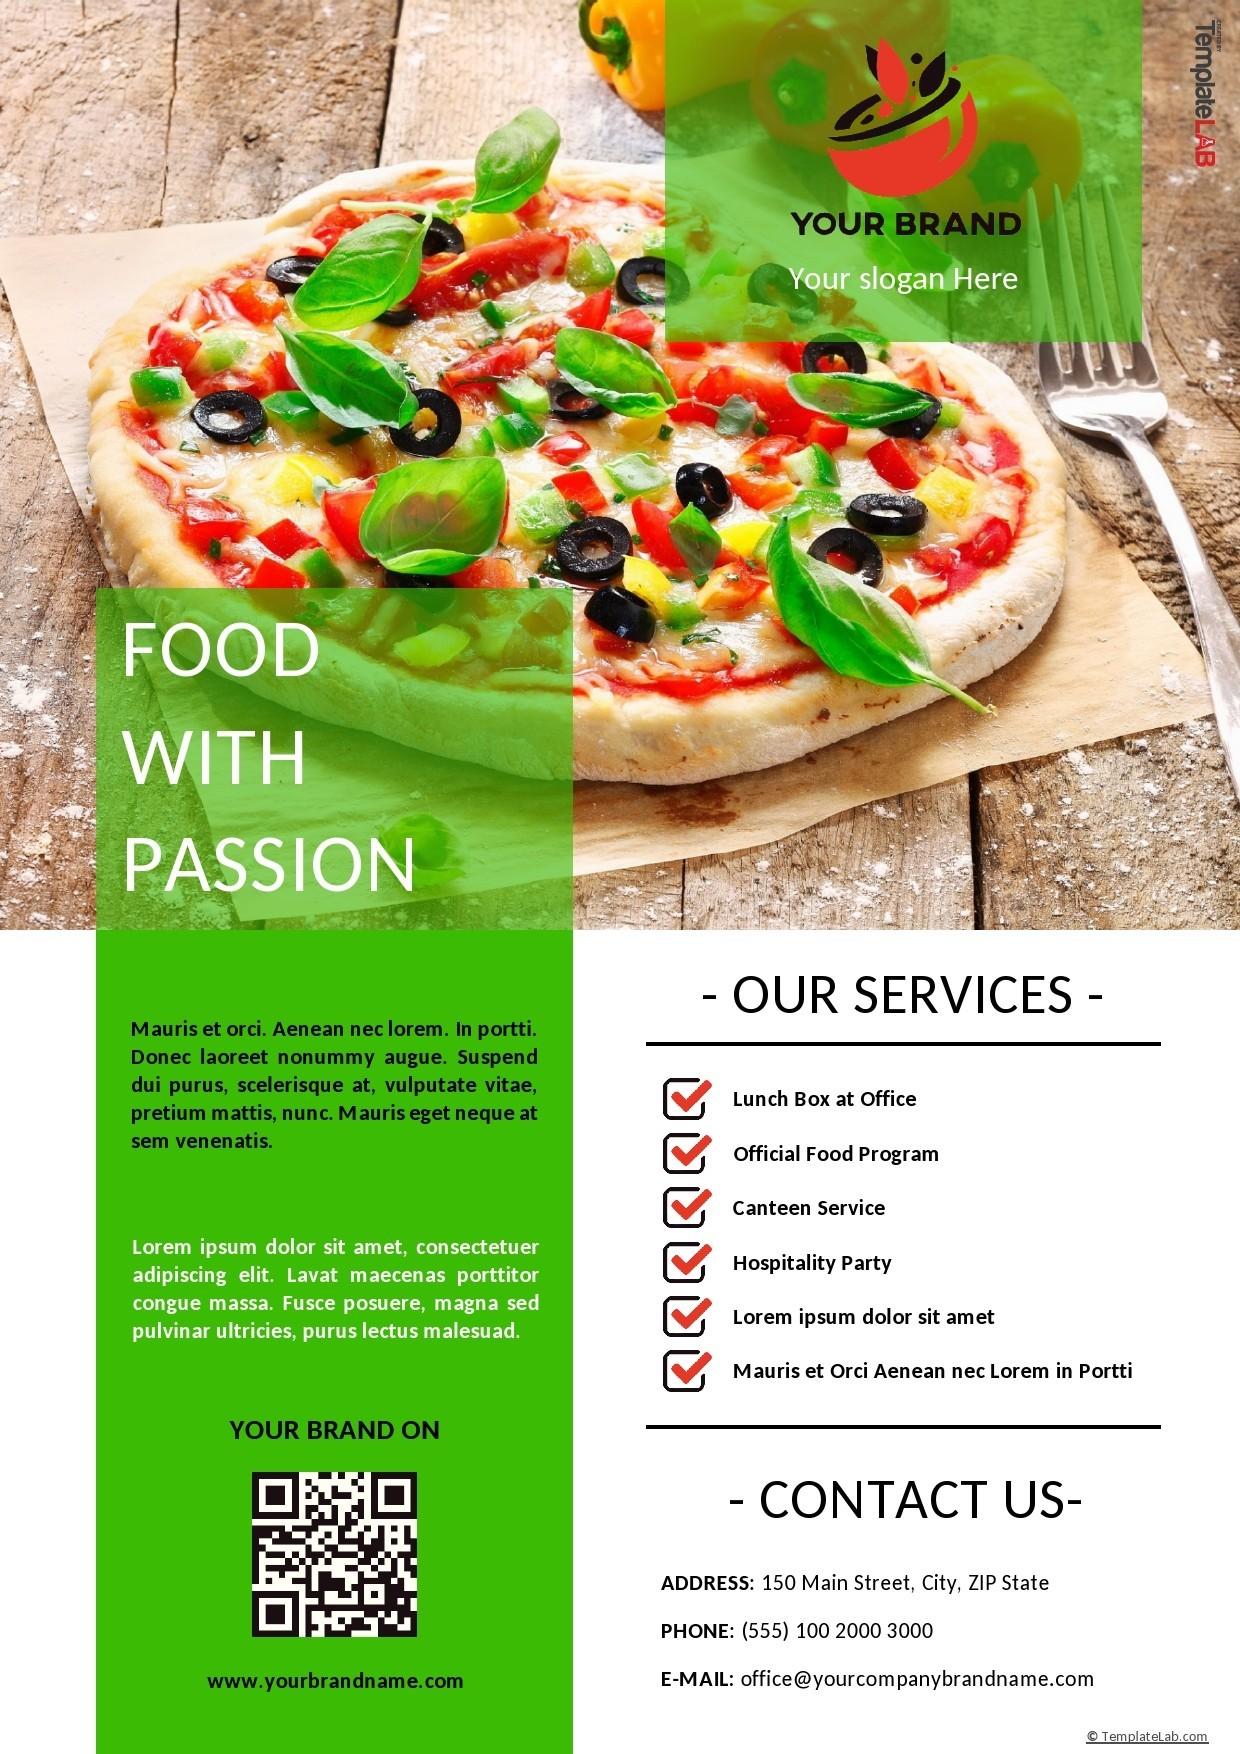 Free Food Company Profile Template - TemplateLab.com